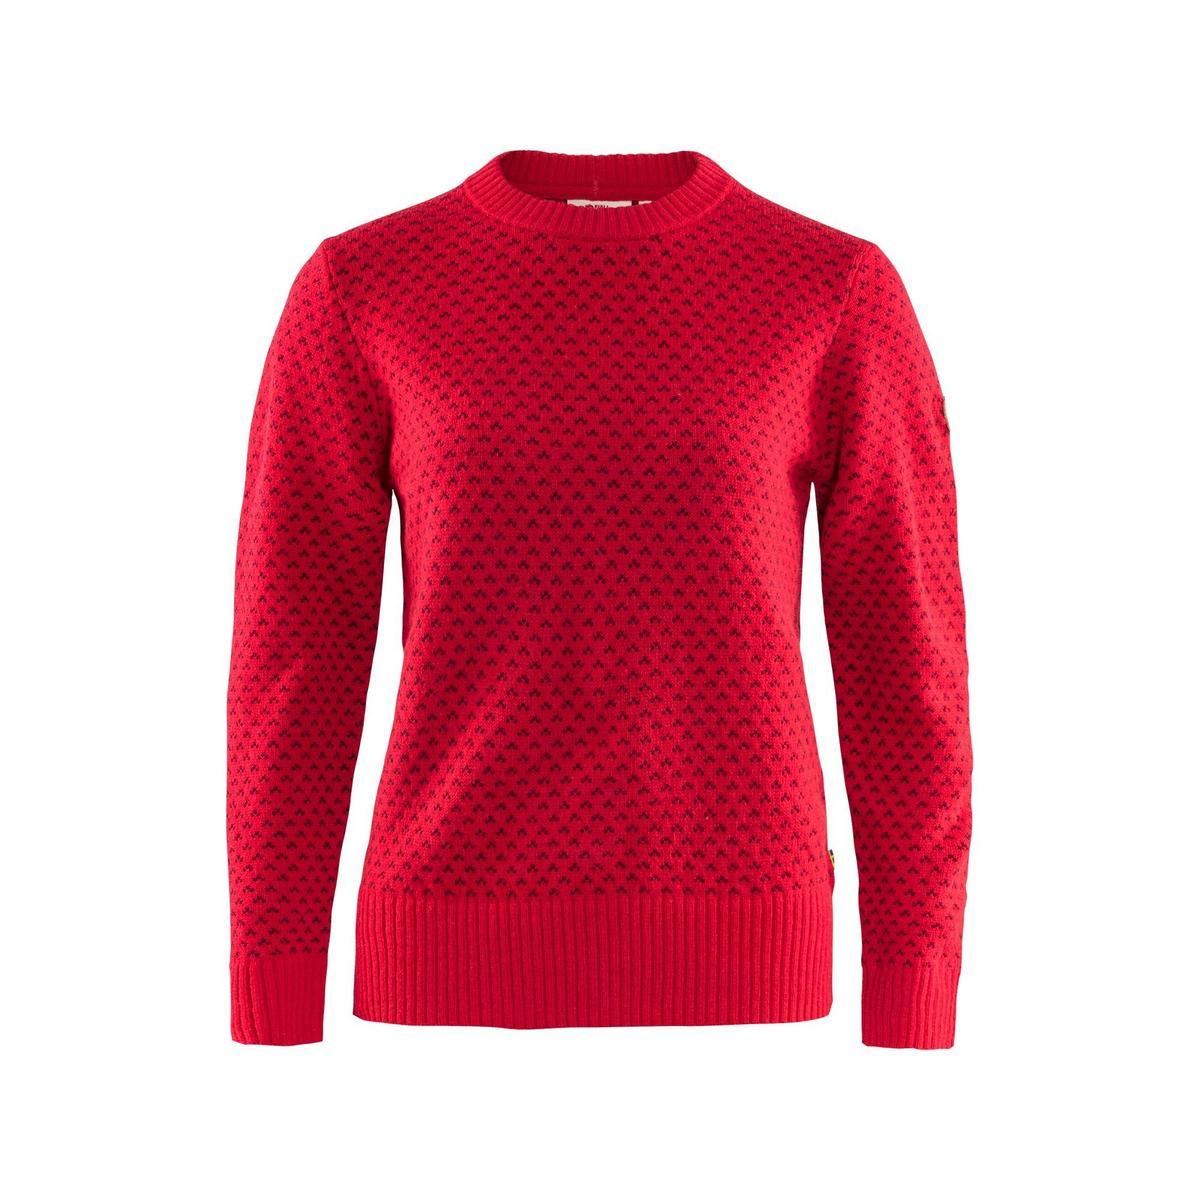 Fjallraven Women's Ovik Sweater - Red